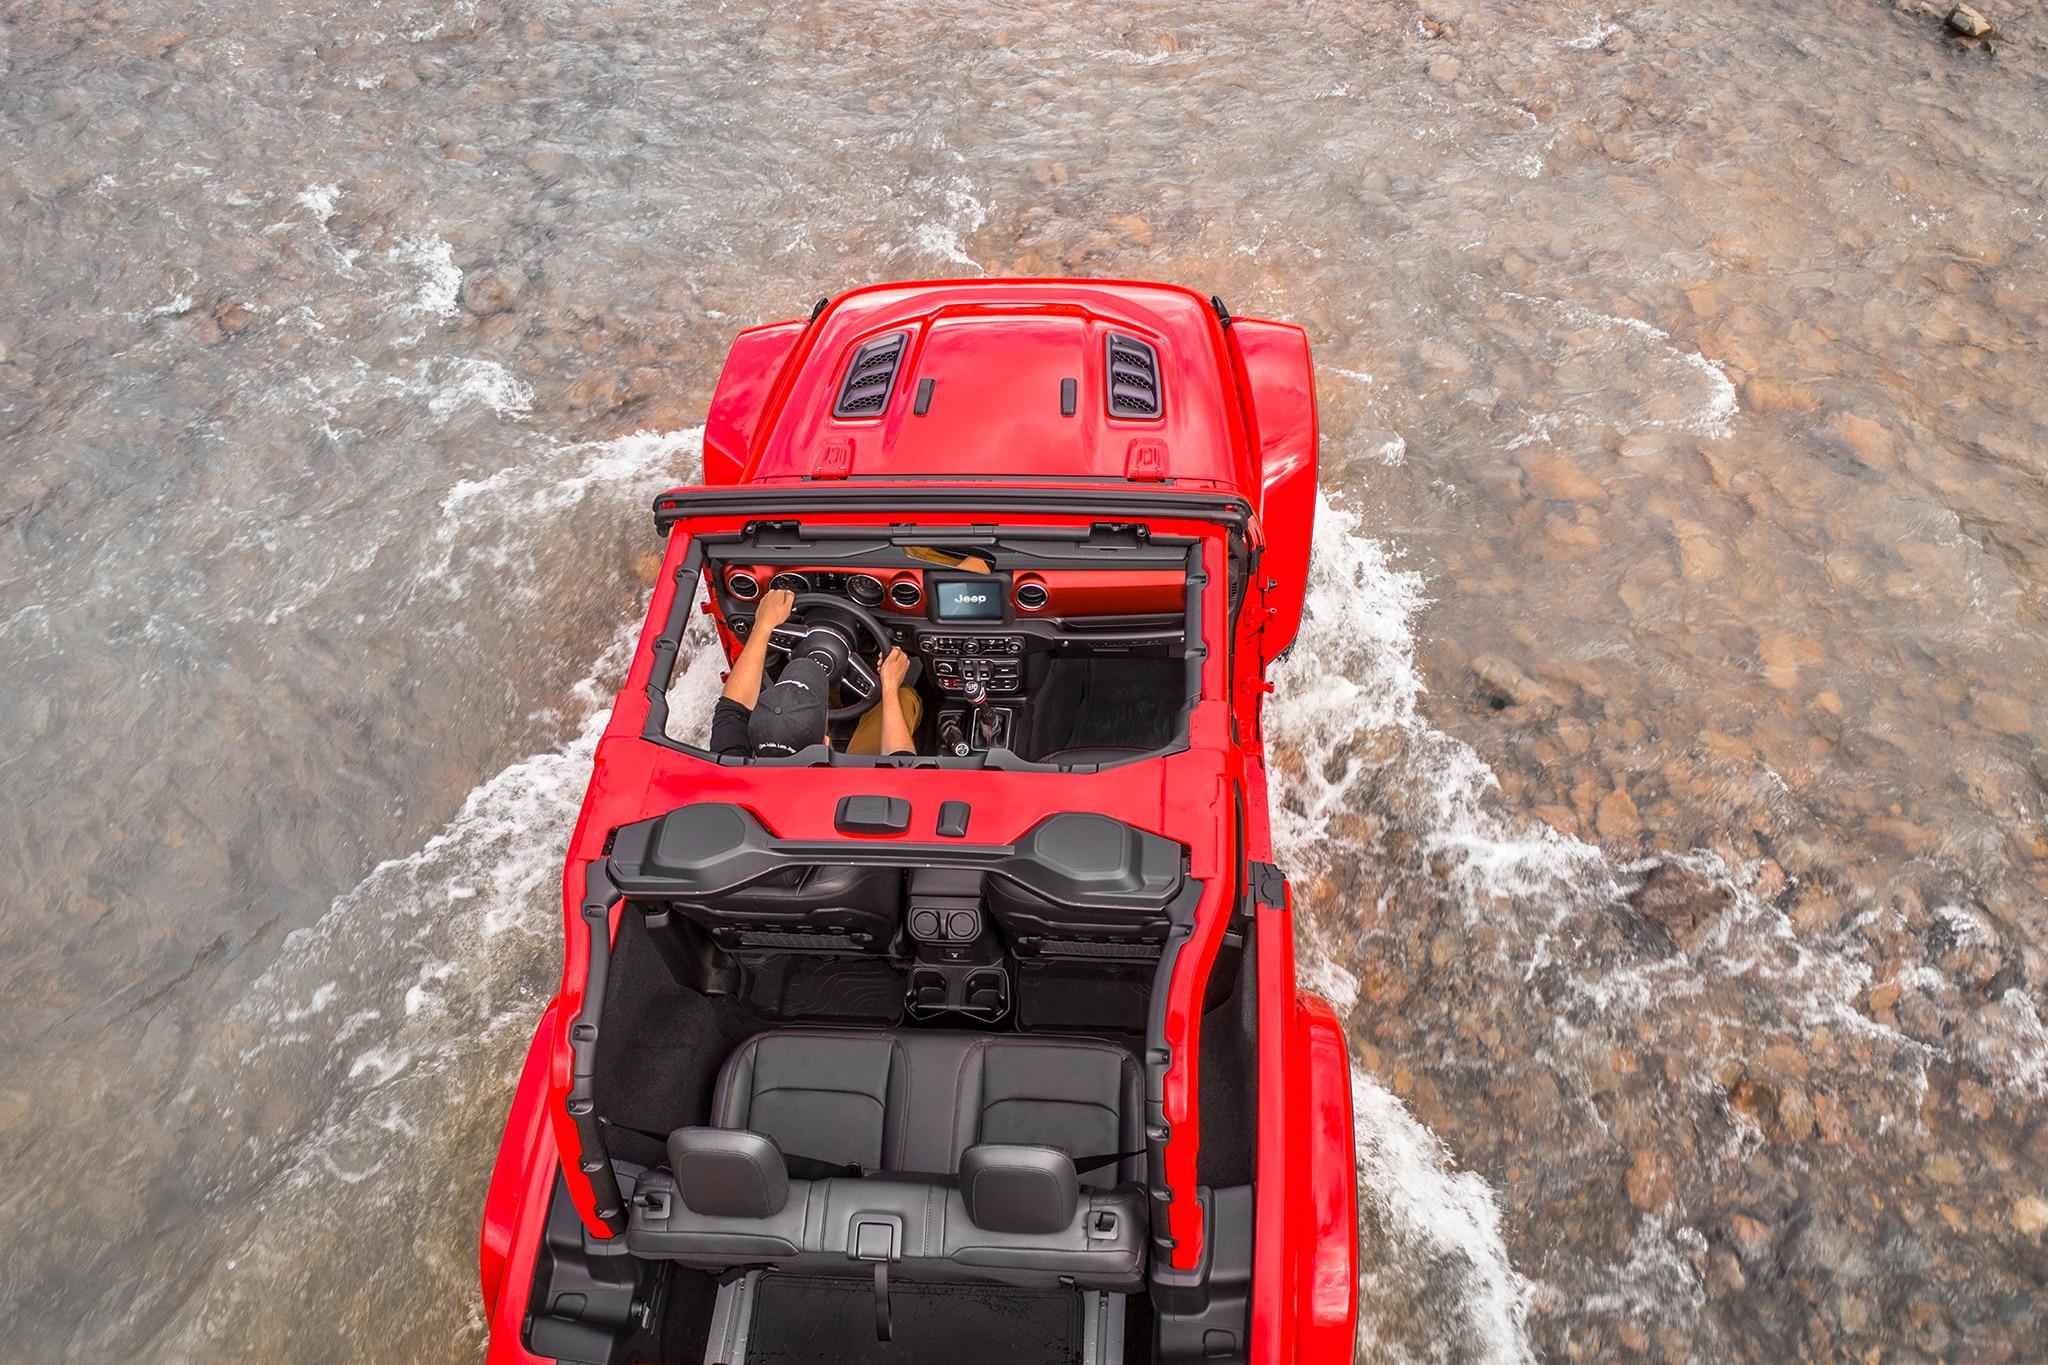 2018 Jeep Wrangler Rubicon First Drive Review Automobile Magazine